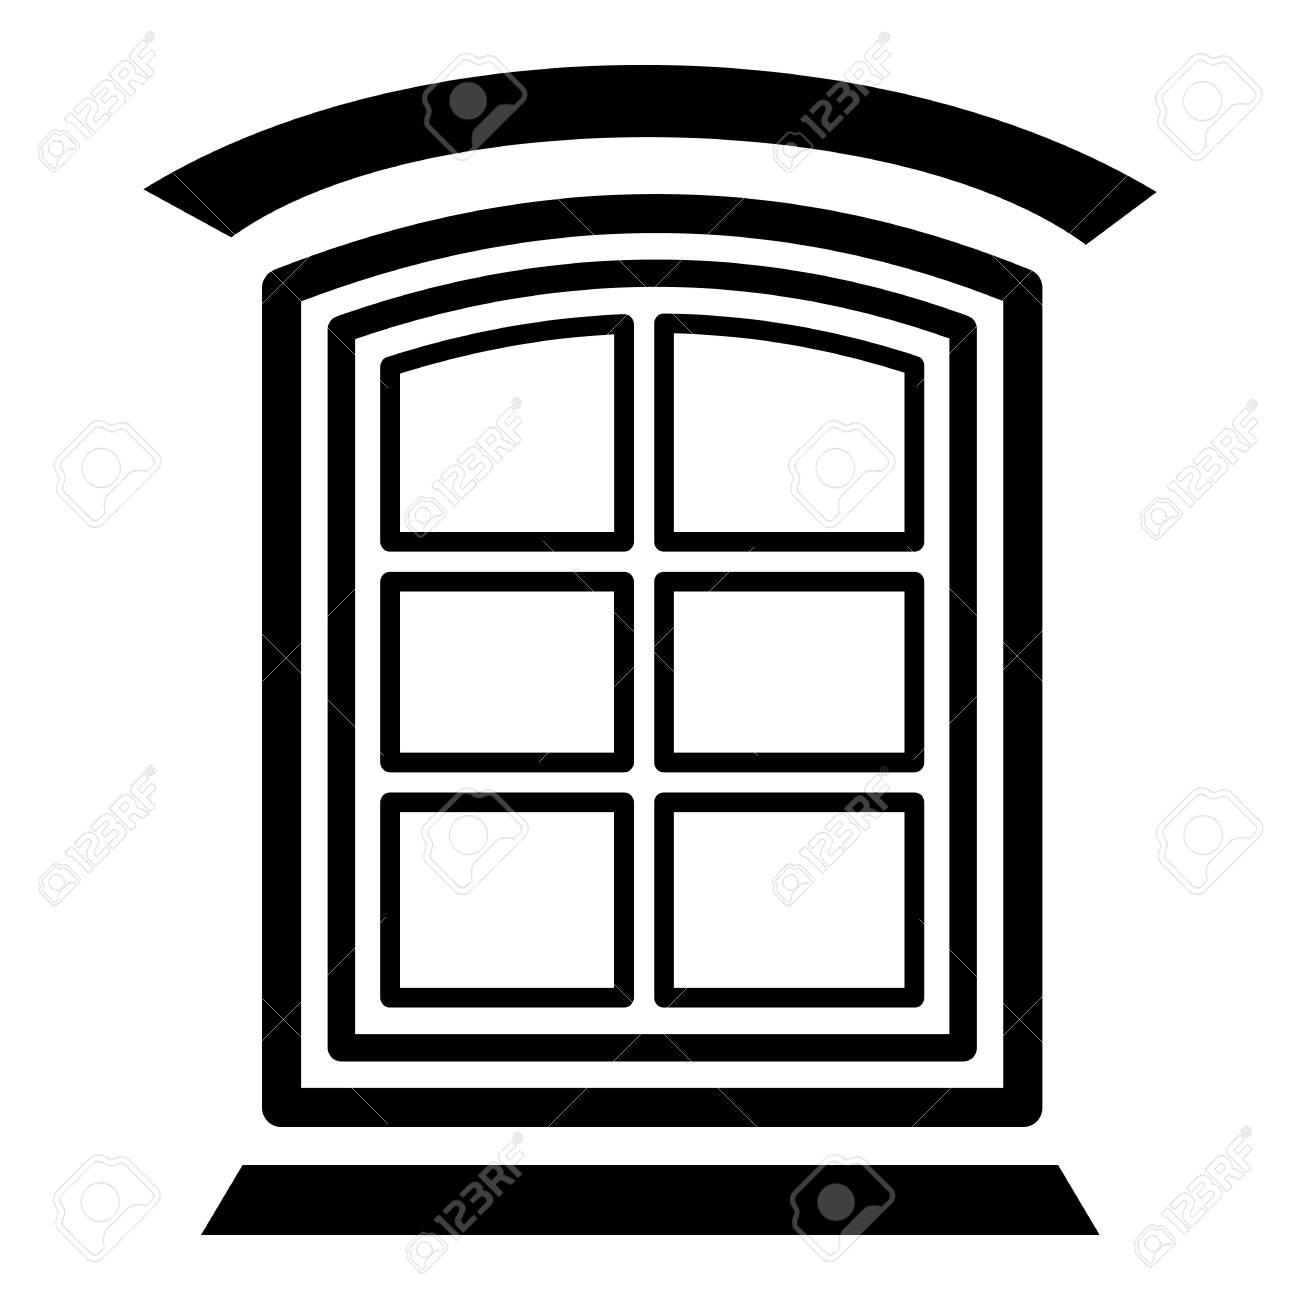 Retro Window Frame Icon. Simple Illustration Of Retro Window ...